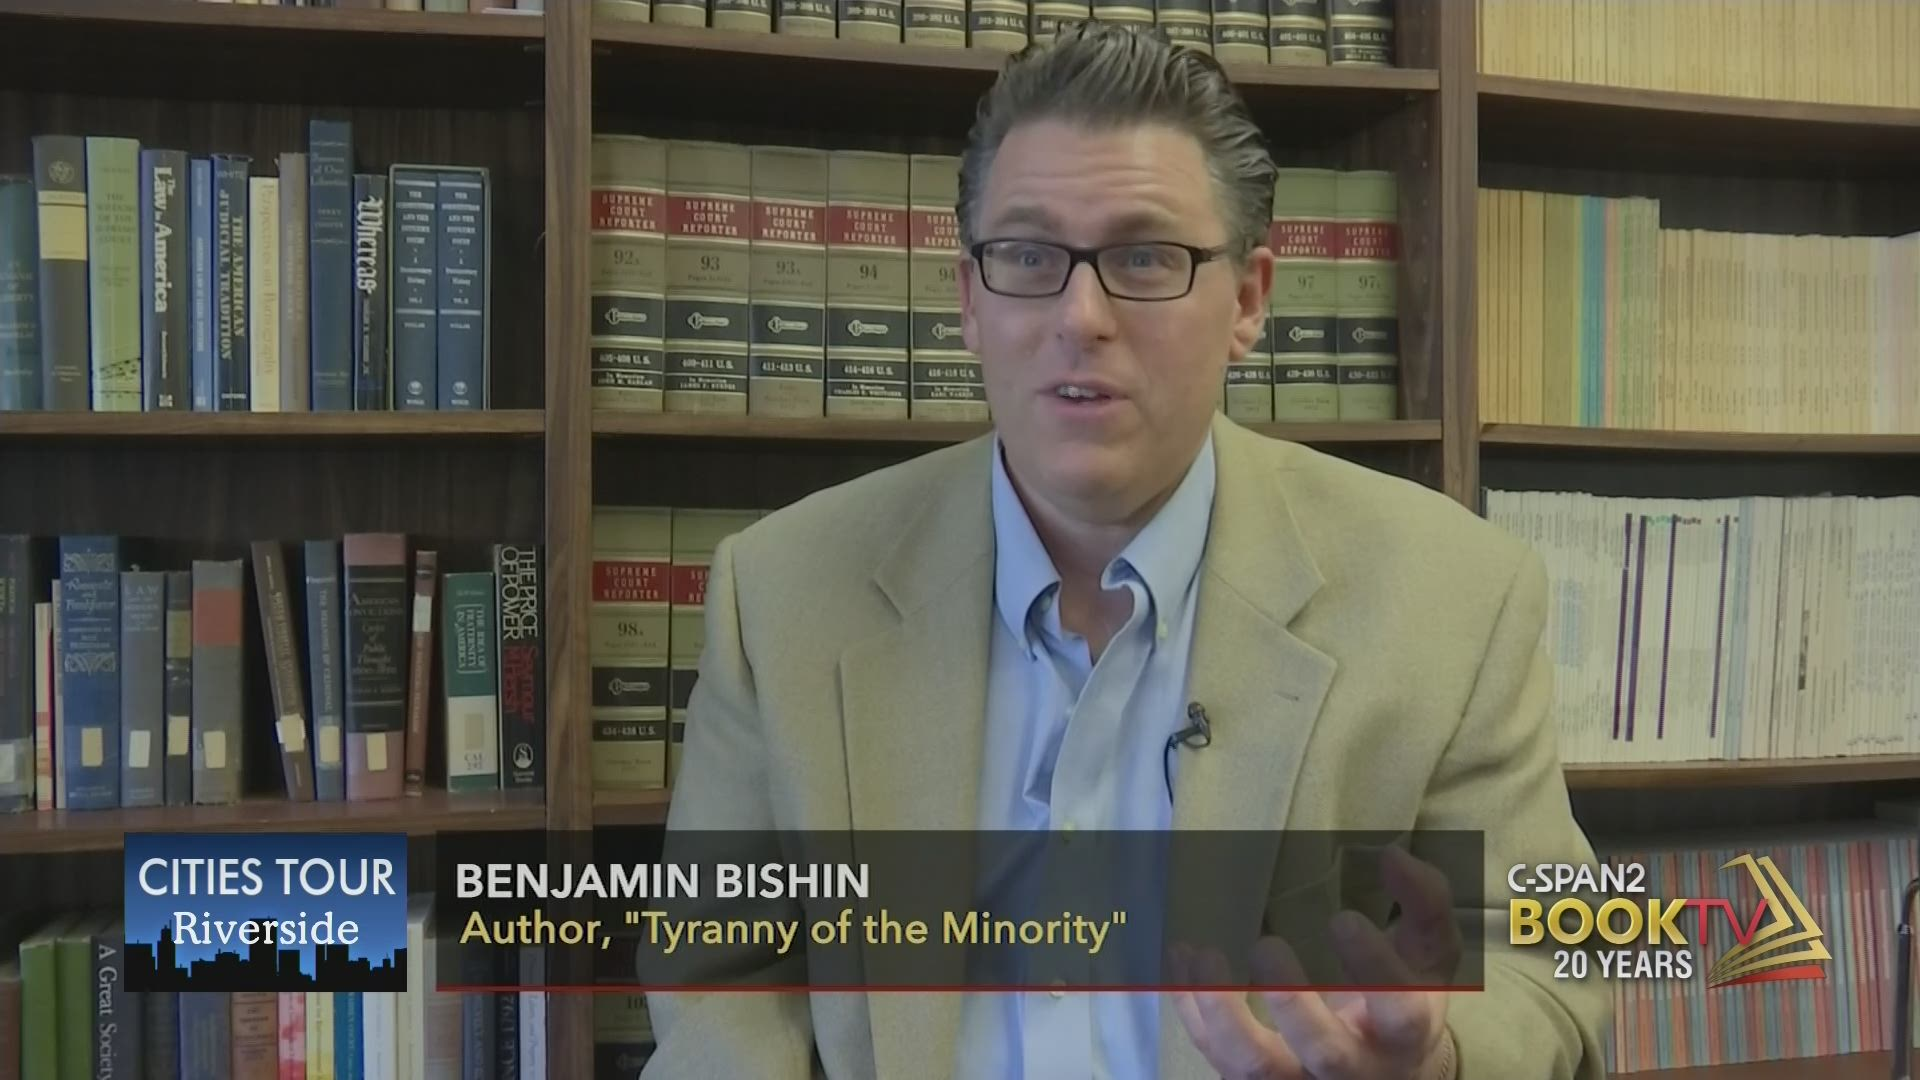 tyranny of the minority examples